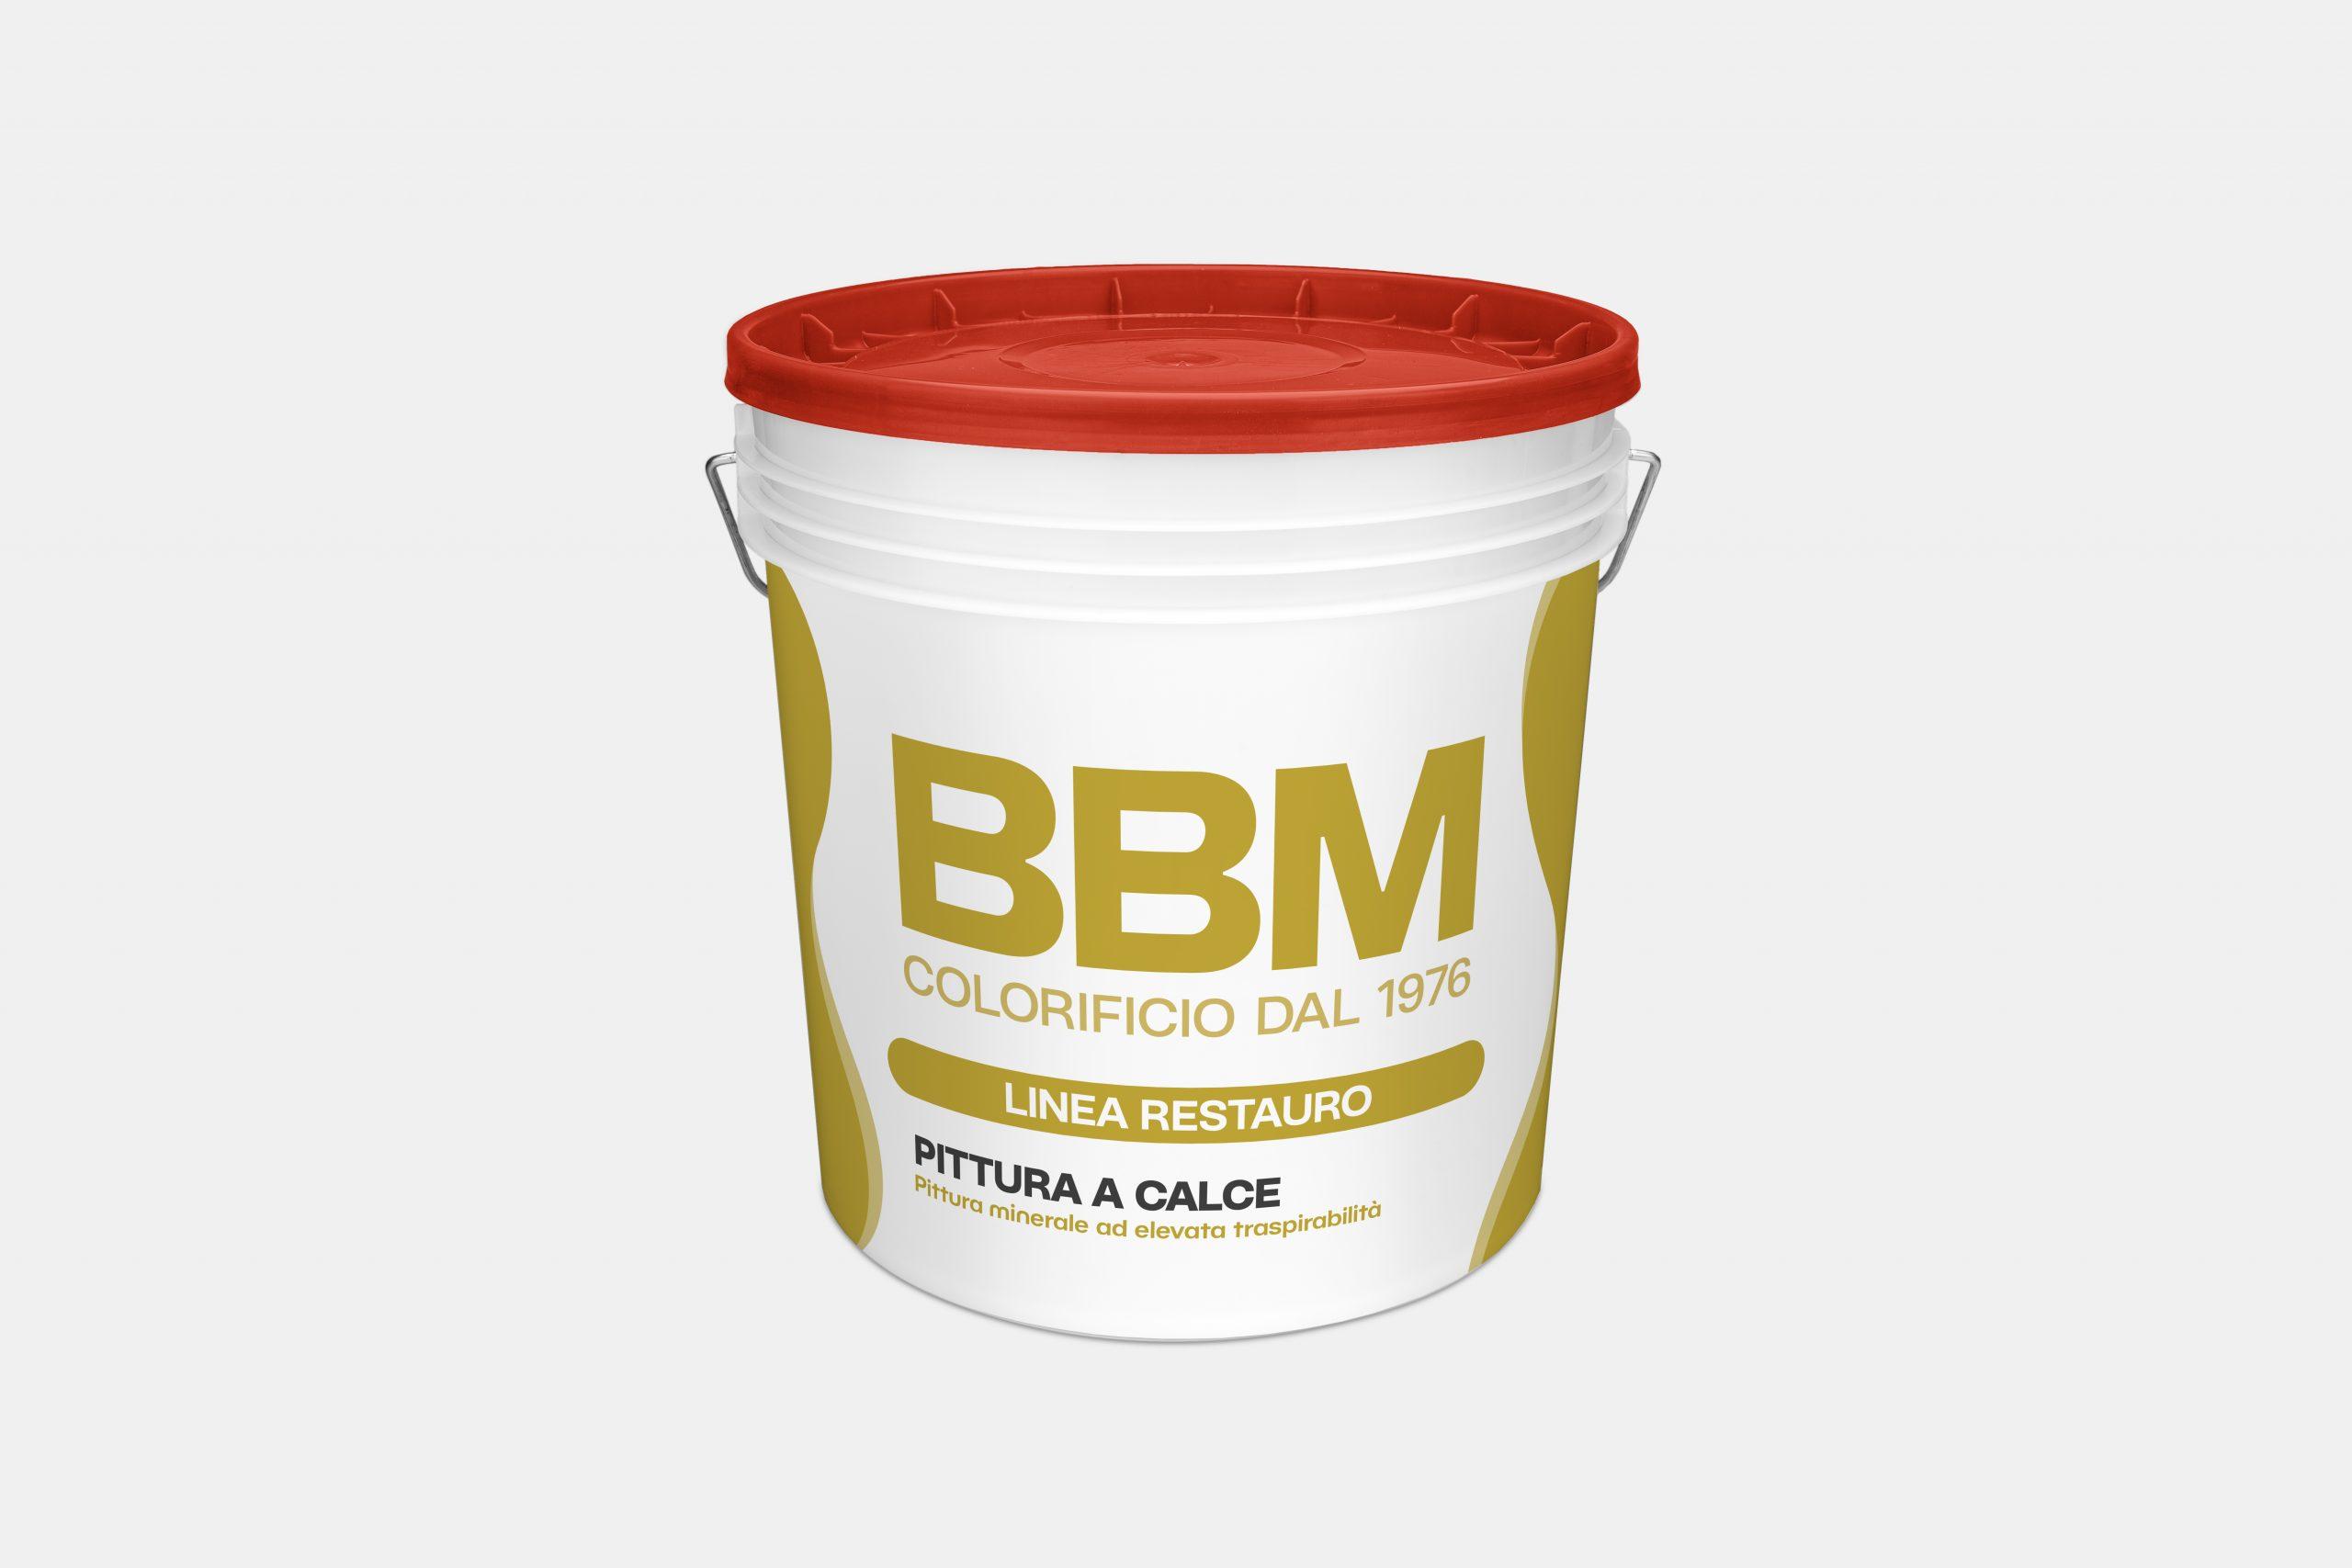 https://bbm-colorificio.it/wp-content/uploads/2021/07/Pittura-a-calce-scaled.jpg